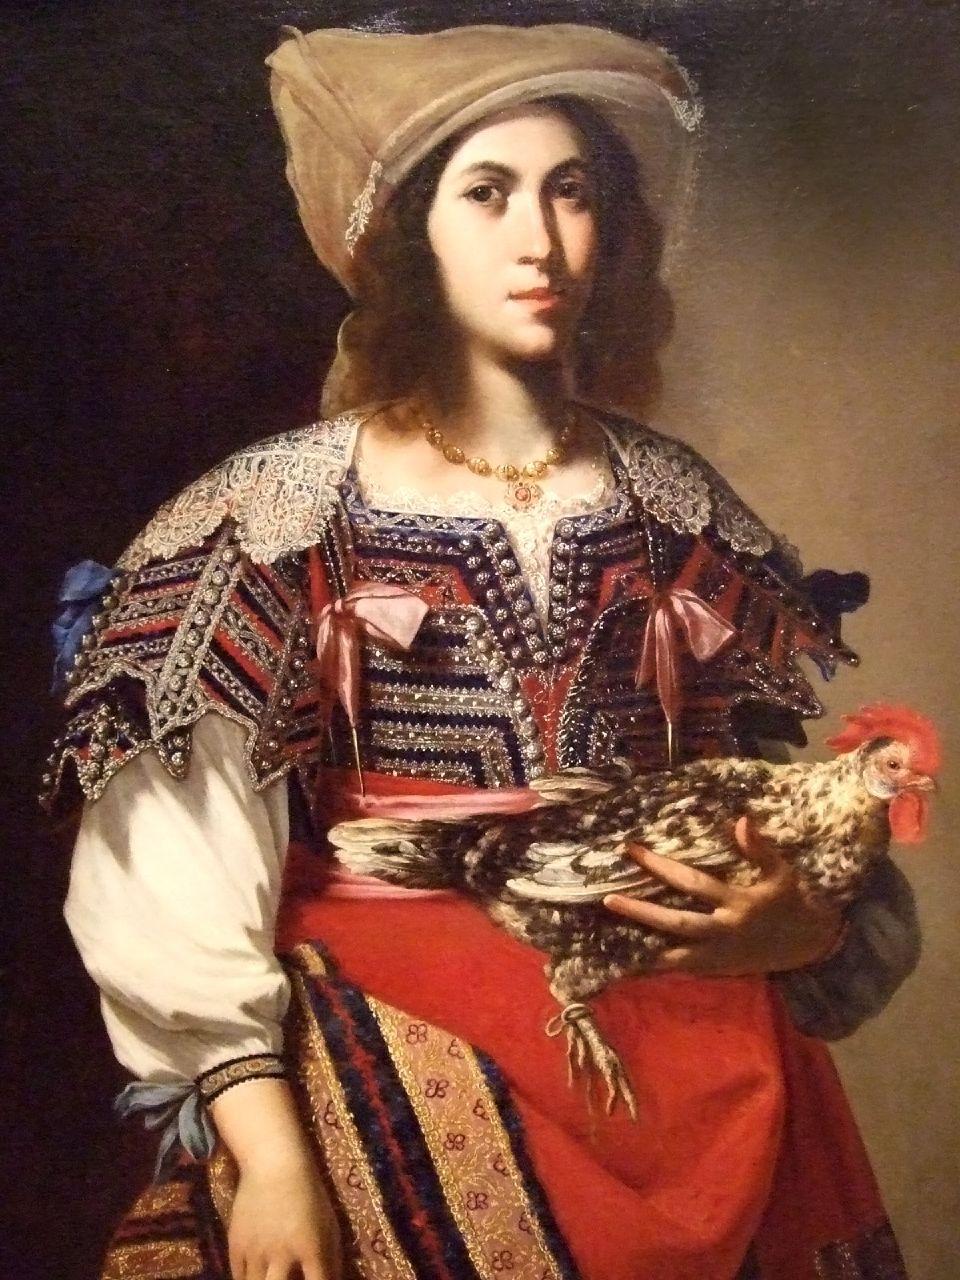 https://i0.wp.com/upload.wikimedia.org/wikipedia/commons/3/39/Stanzione%2C_Massimo_-_Woman_in_Neapolitan_Costume_-_1635.jpg